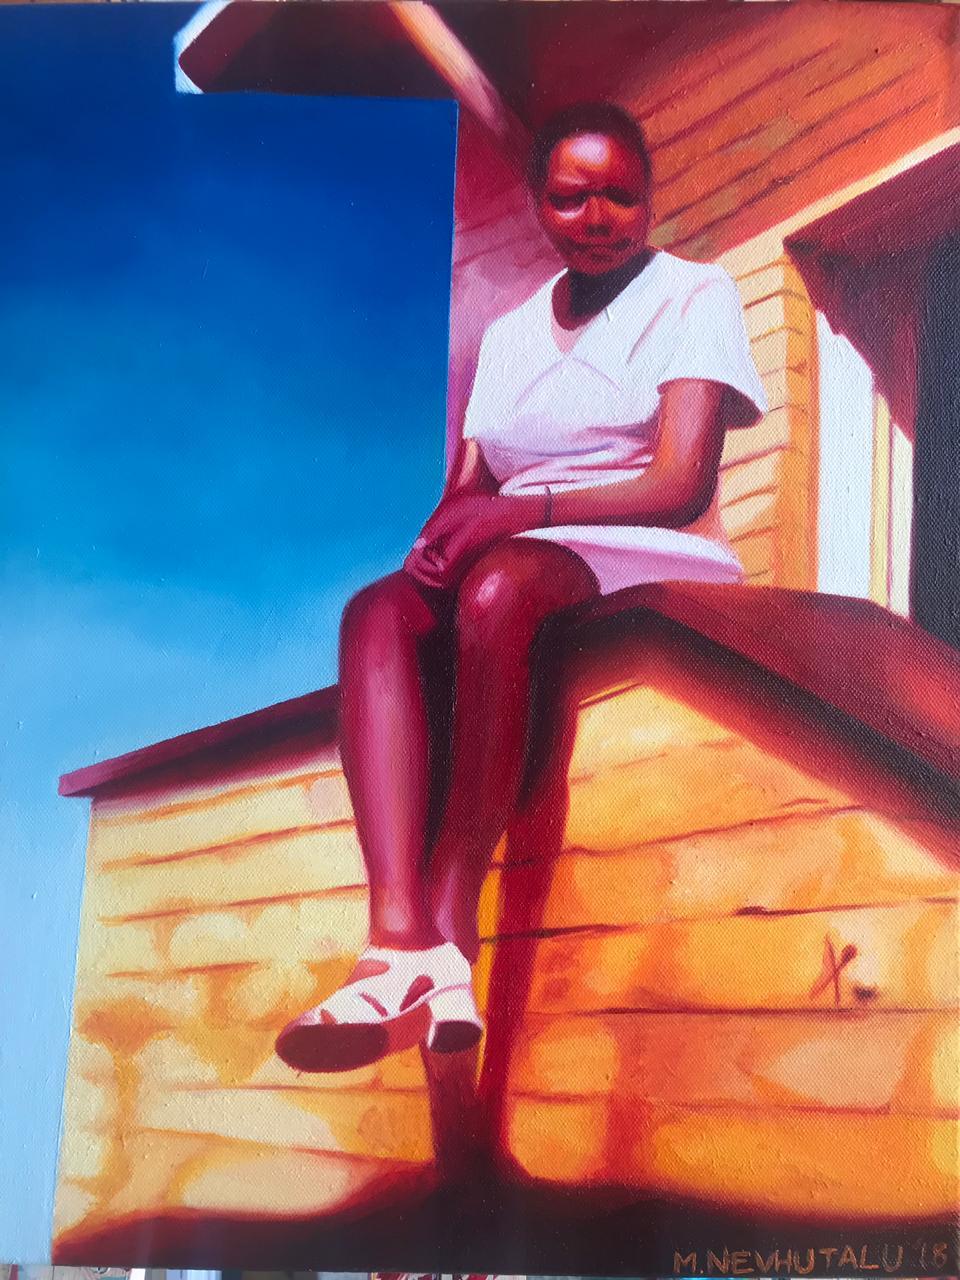 Nevhutalu Mashudu, Summer School II, 2018  Oil on Canvas  29,7cm x 42cm  Framed – R5400